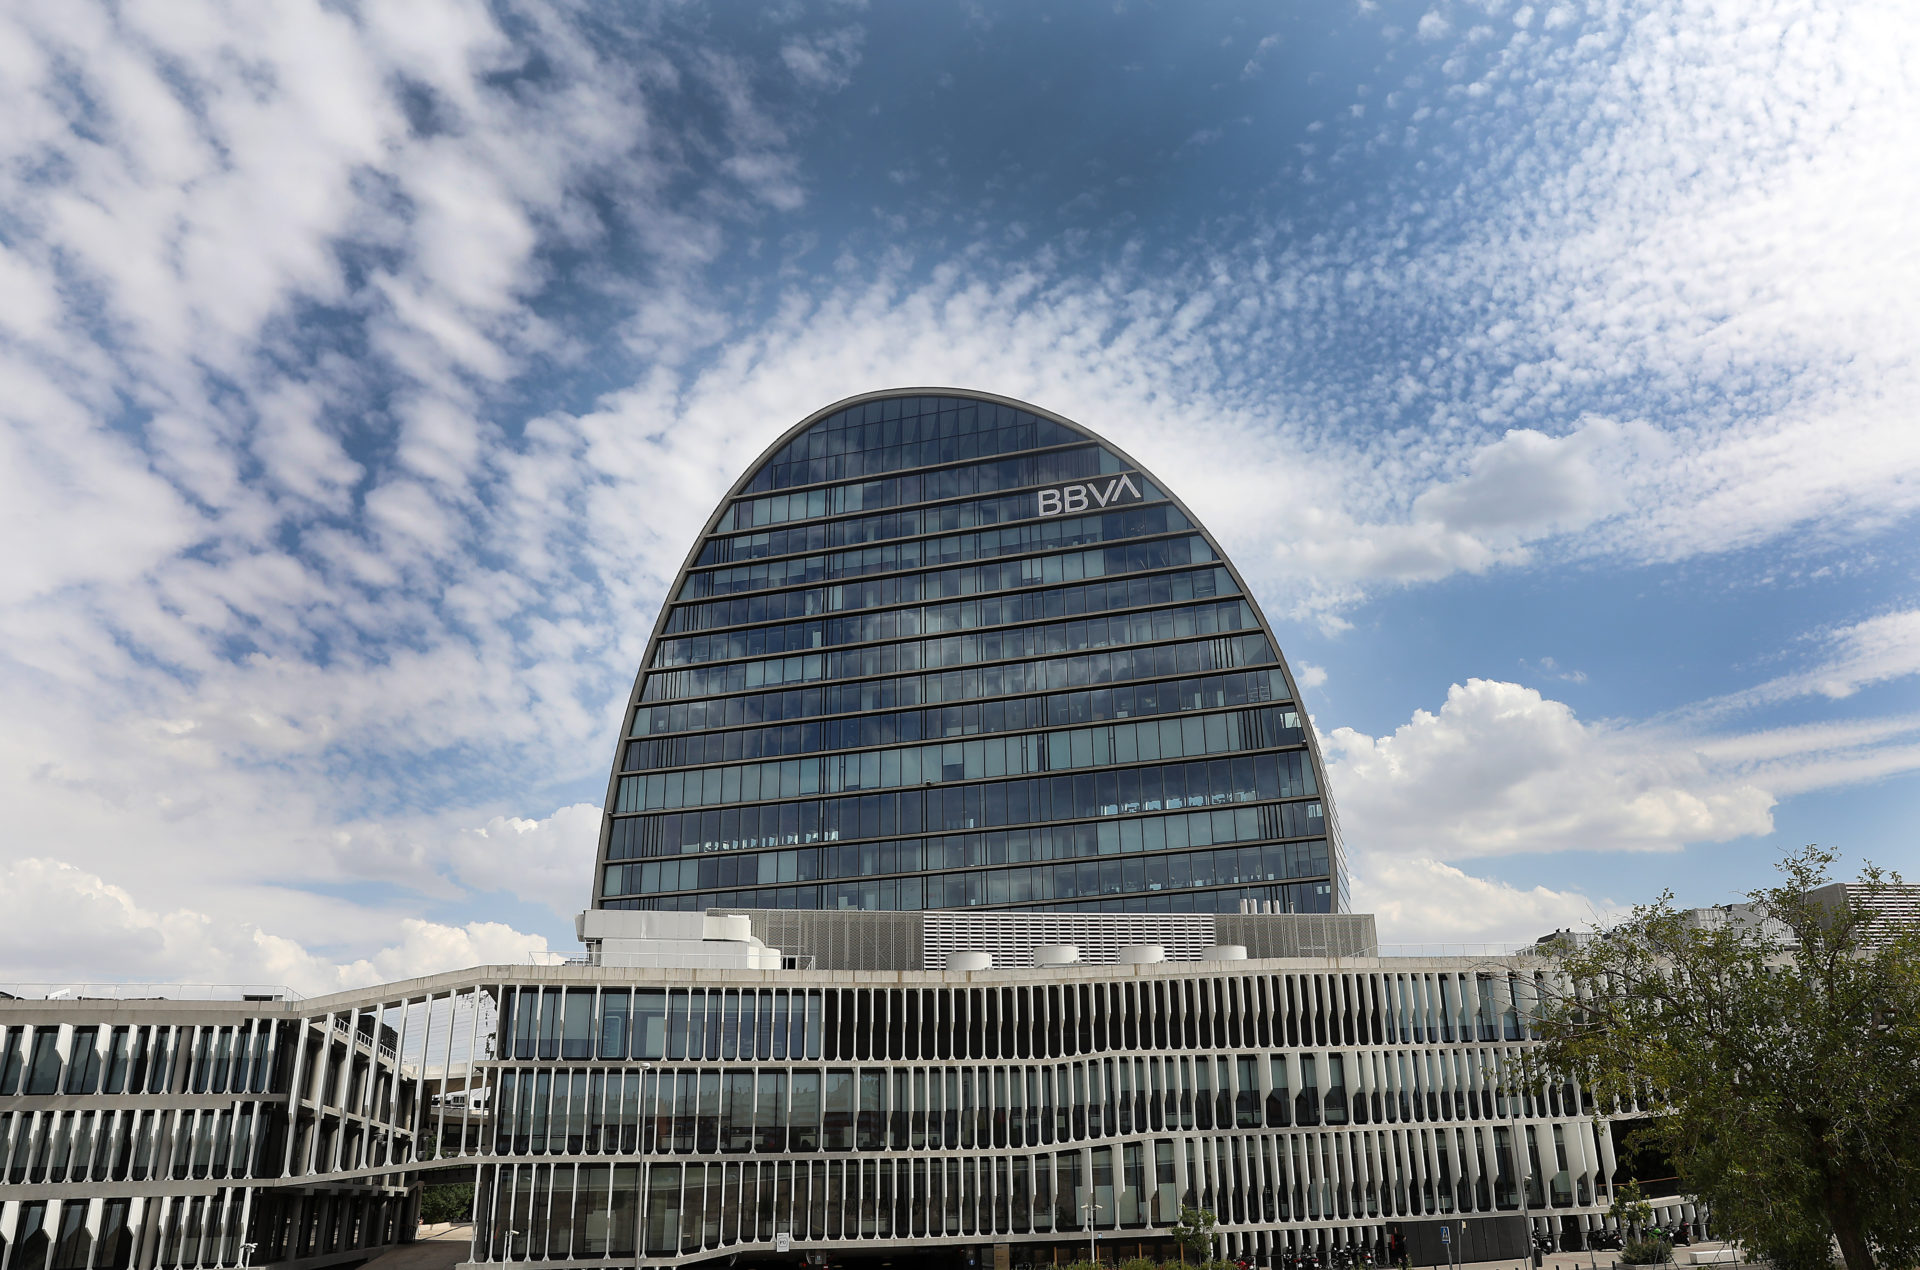 https://shareholdersandinvestors.bbva.com/wp-content/uploads/2019/07/vela-ciudad-bbva-nuevo-logo.jpg